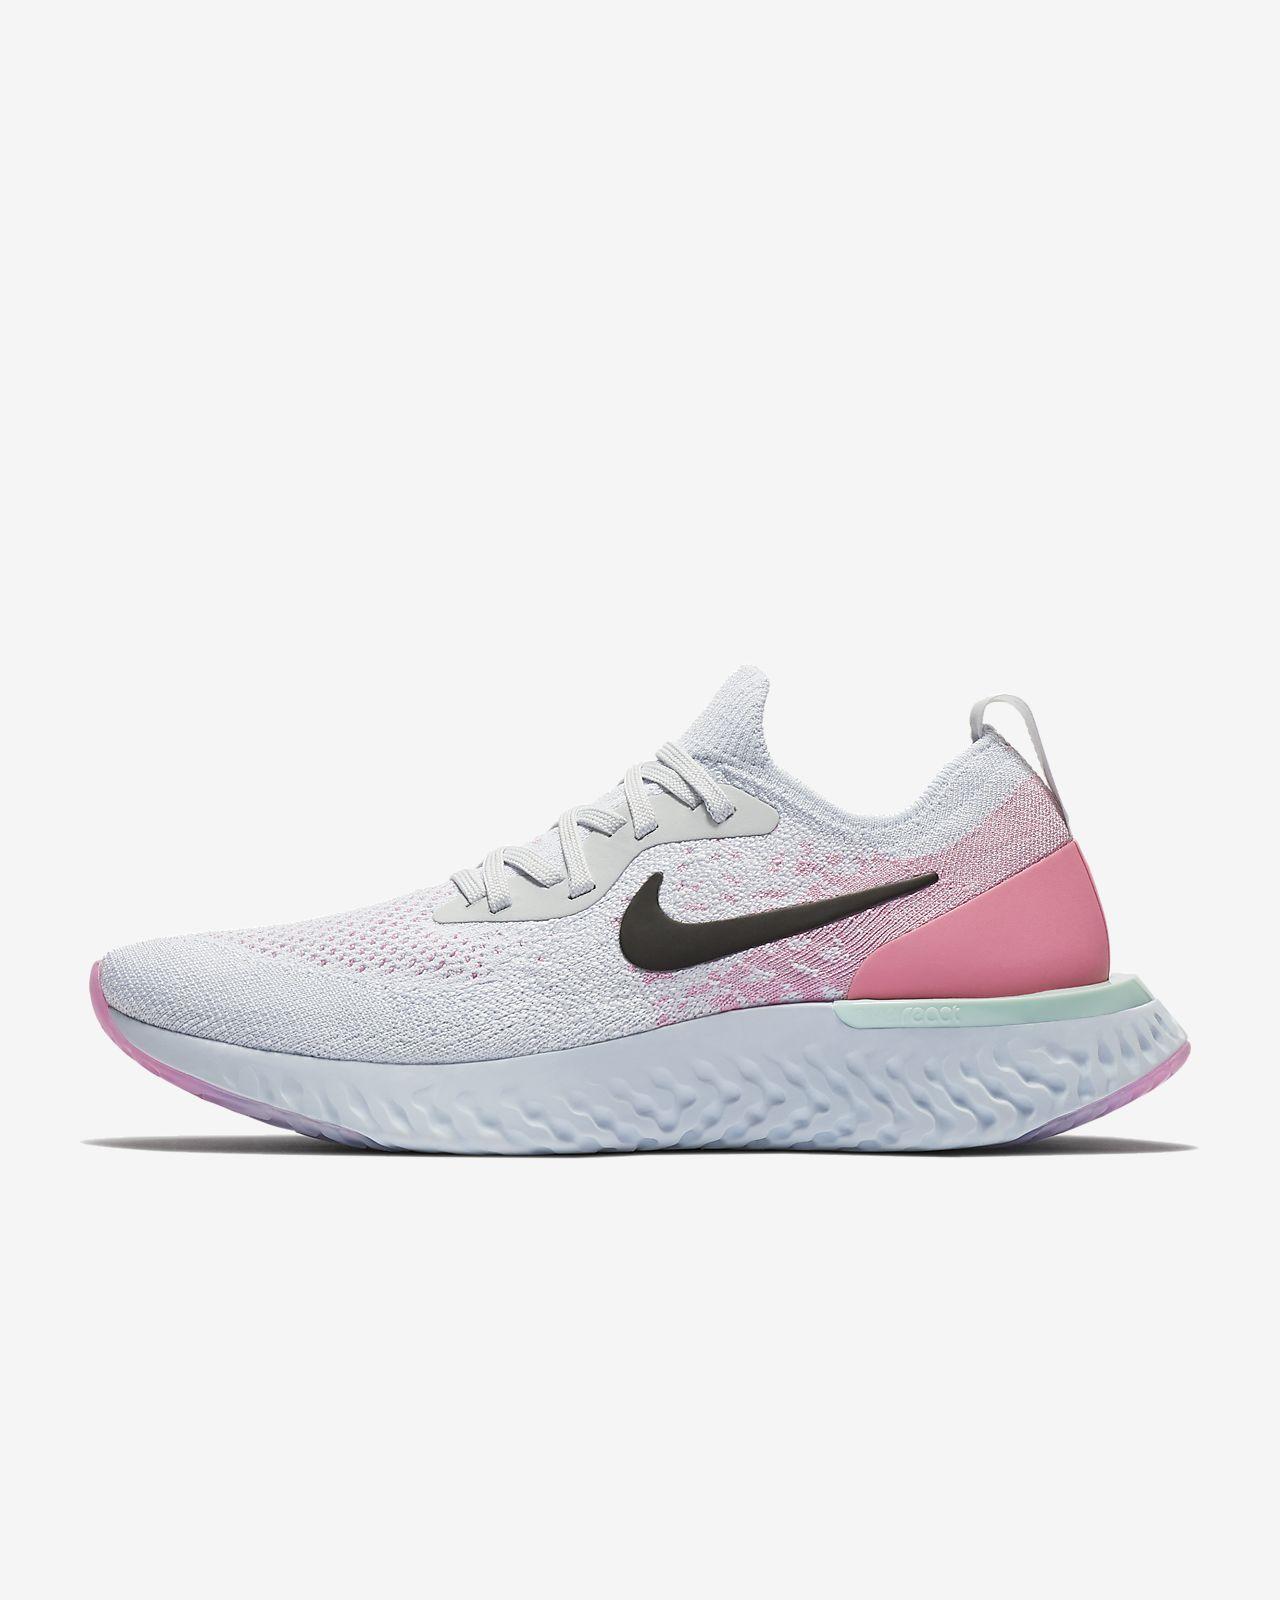 scarpe nike per mezza maratona